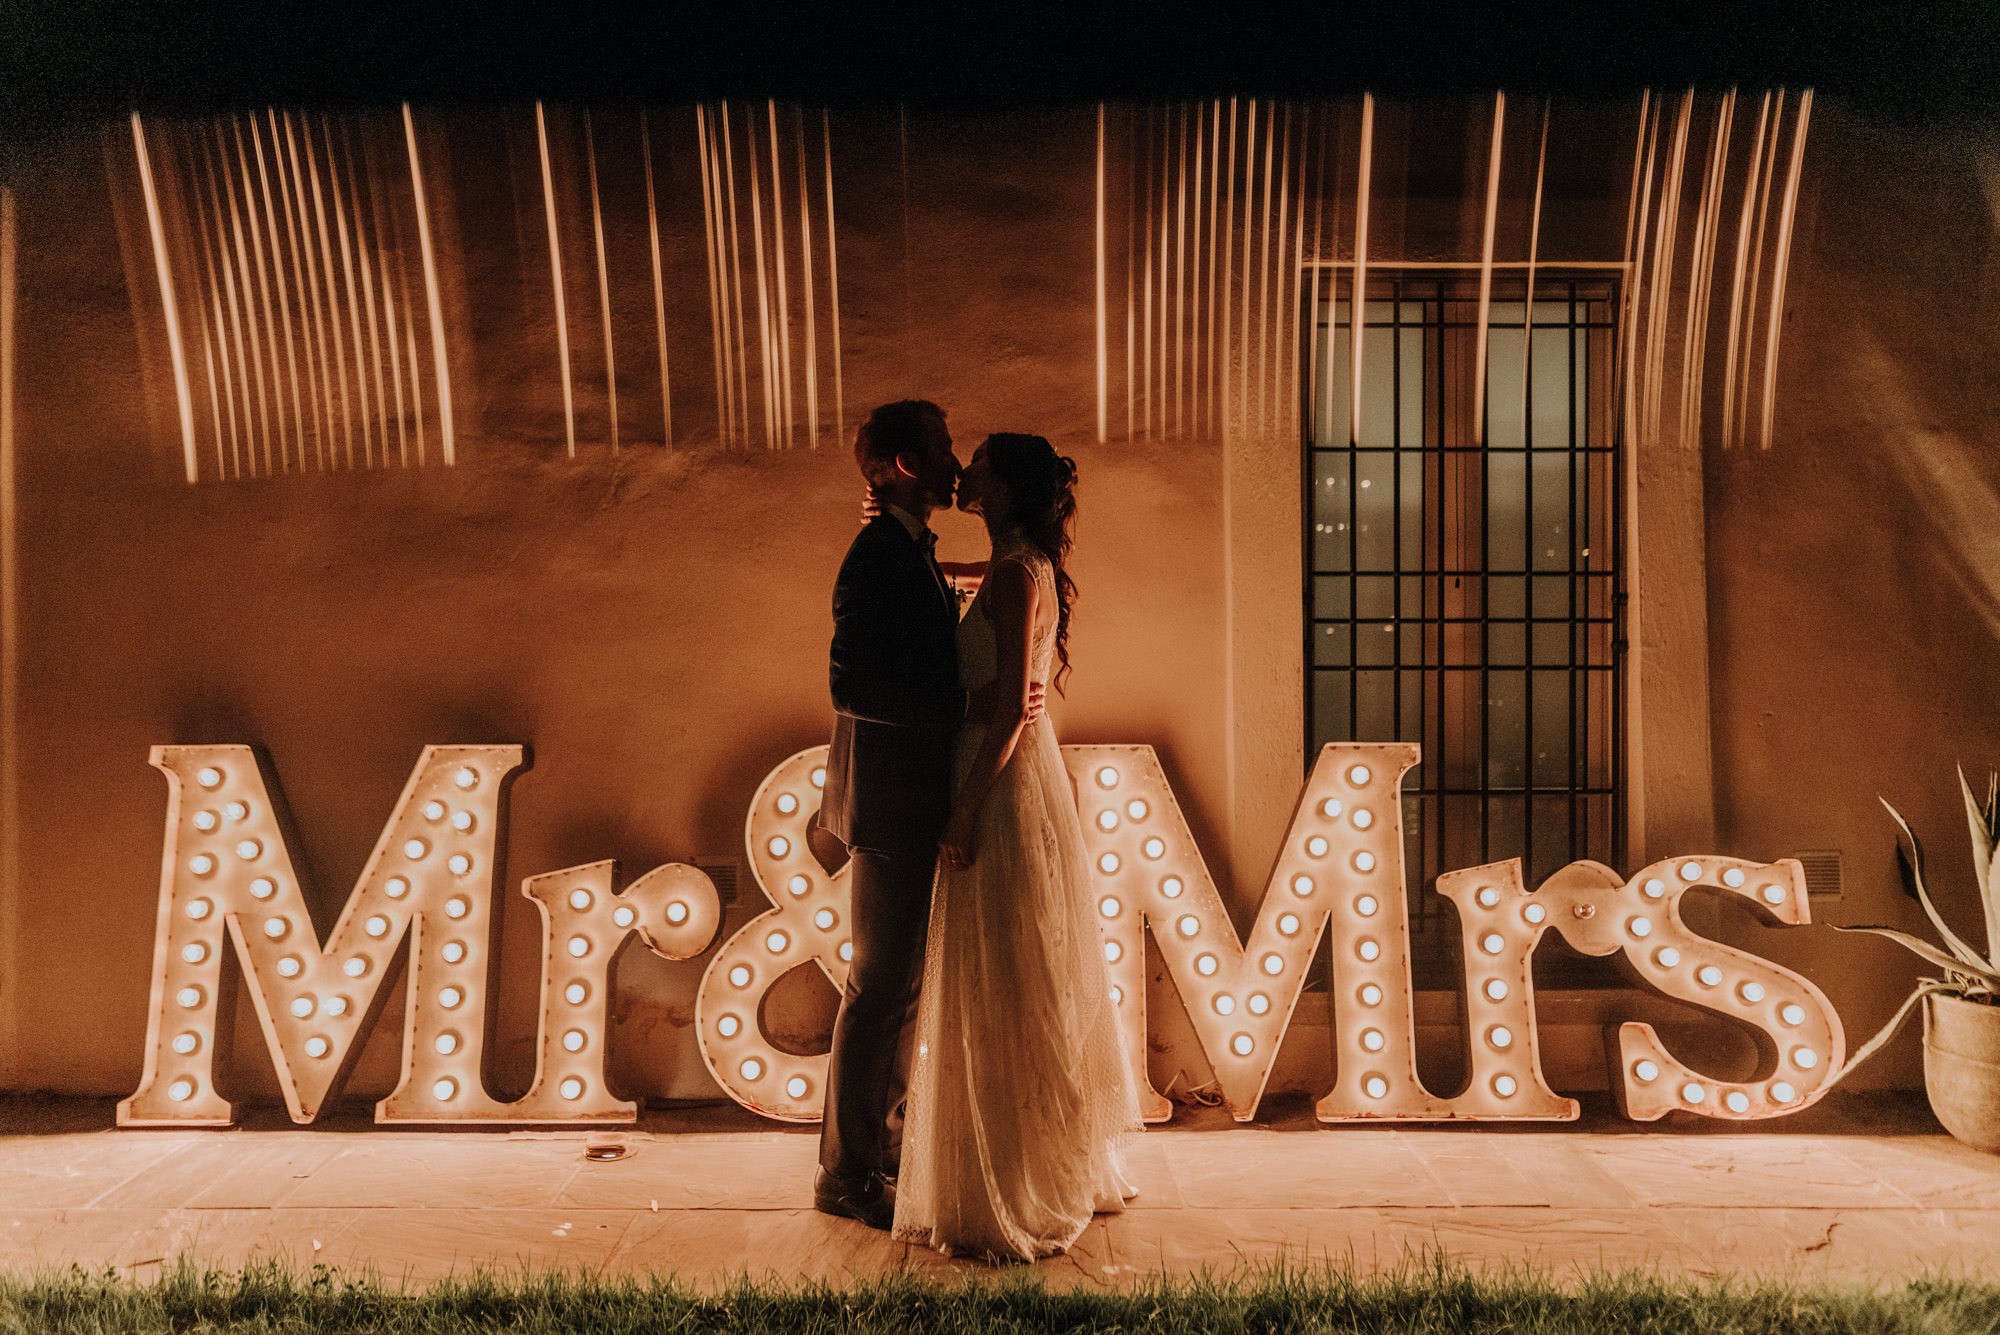 FOTO+PHOTO+BODA+WEDDING+ITALIA+ITALY+MAURICIO+GARAY+MAURICIOGARAY+WEDDINPHOTOGRAPHER+FOTOGRAFODEBODA-2019.jpg